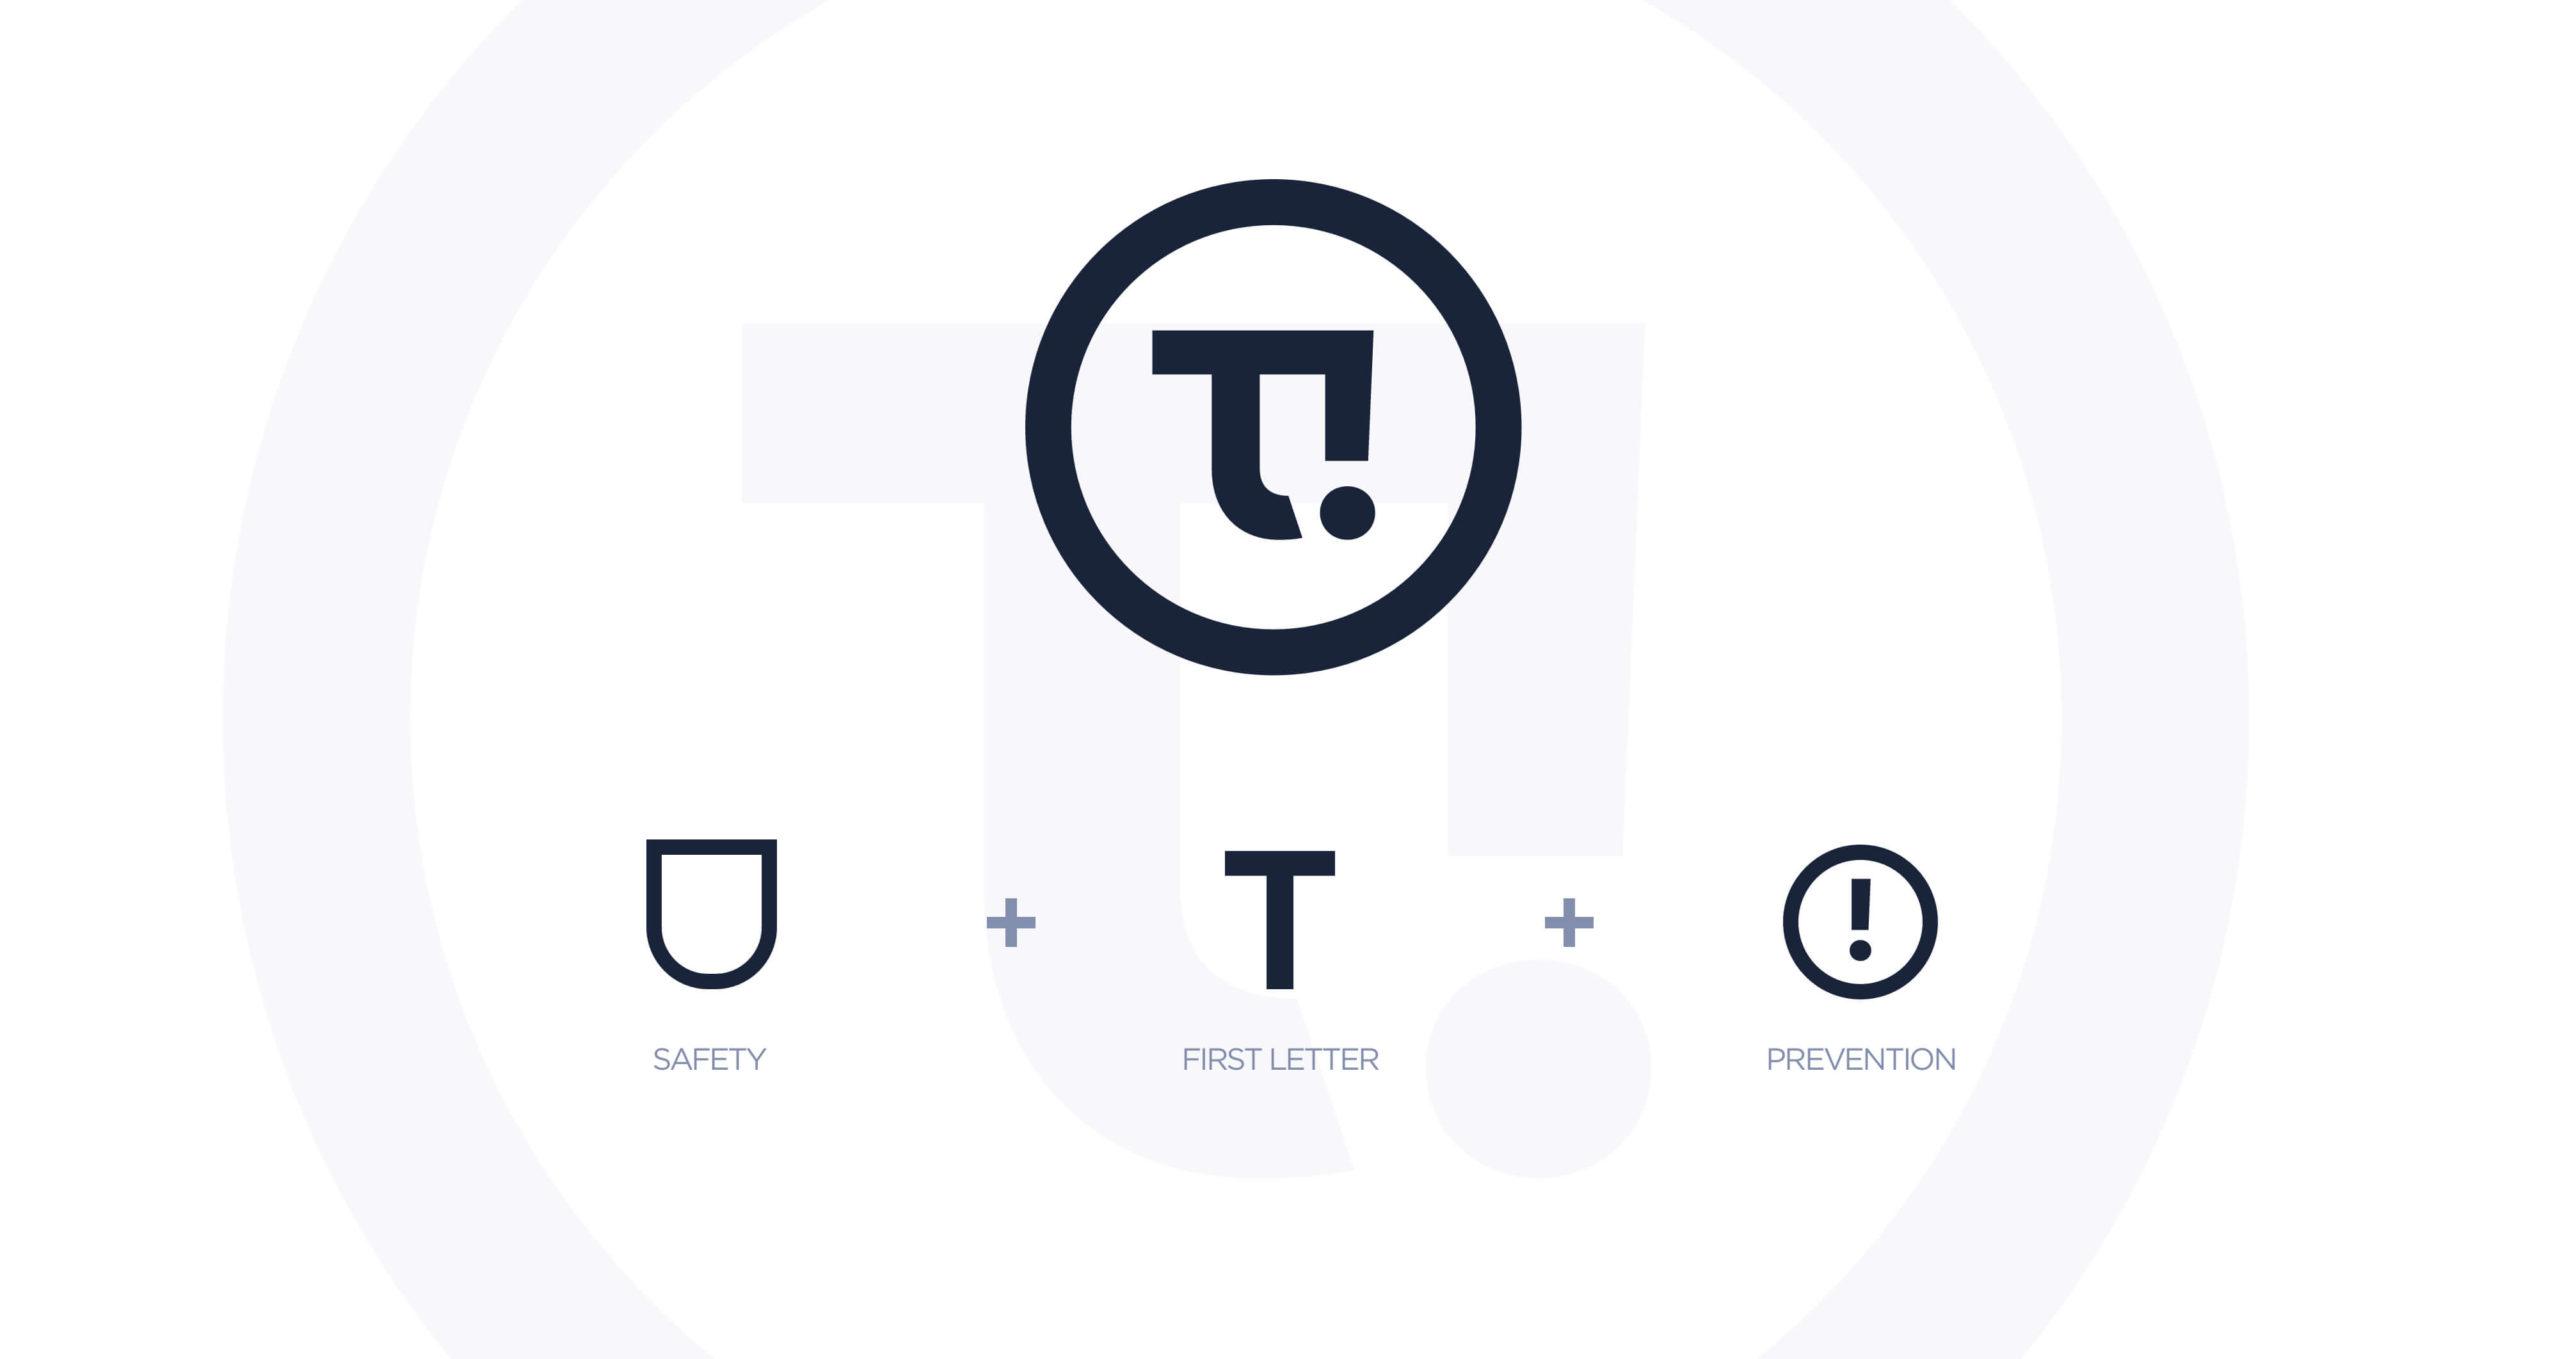 tassart-associes-branding-ux-io-site-illustration-03